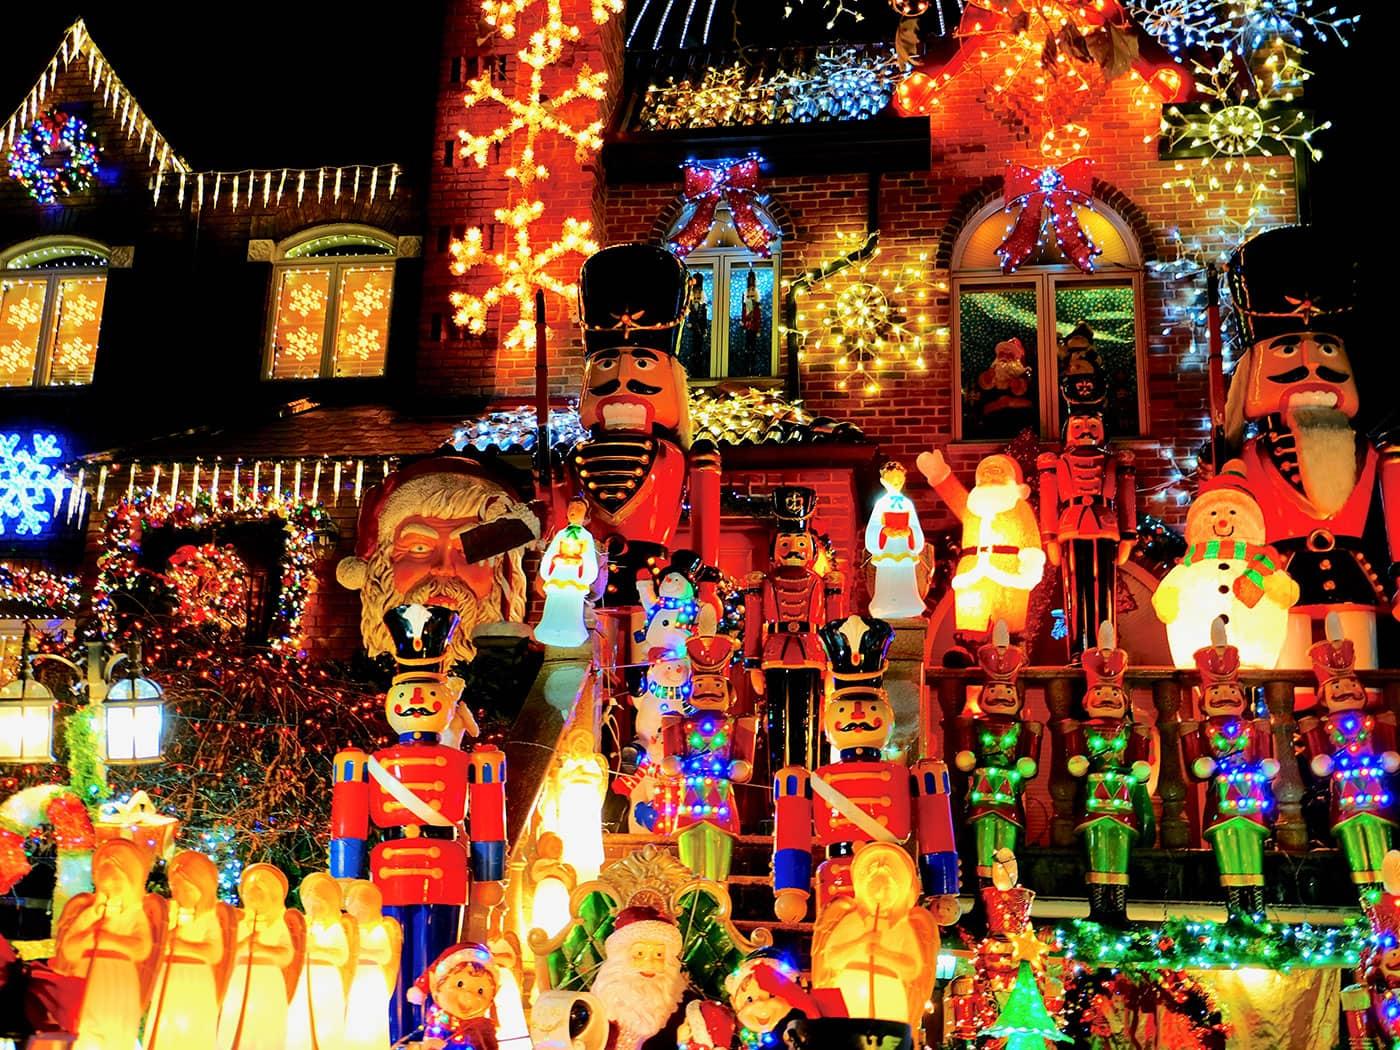 Dyker Heights Christmas Lights - Bonecos